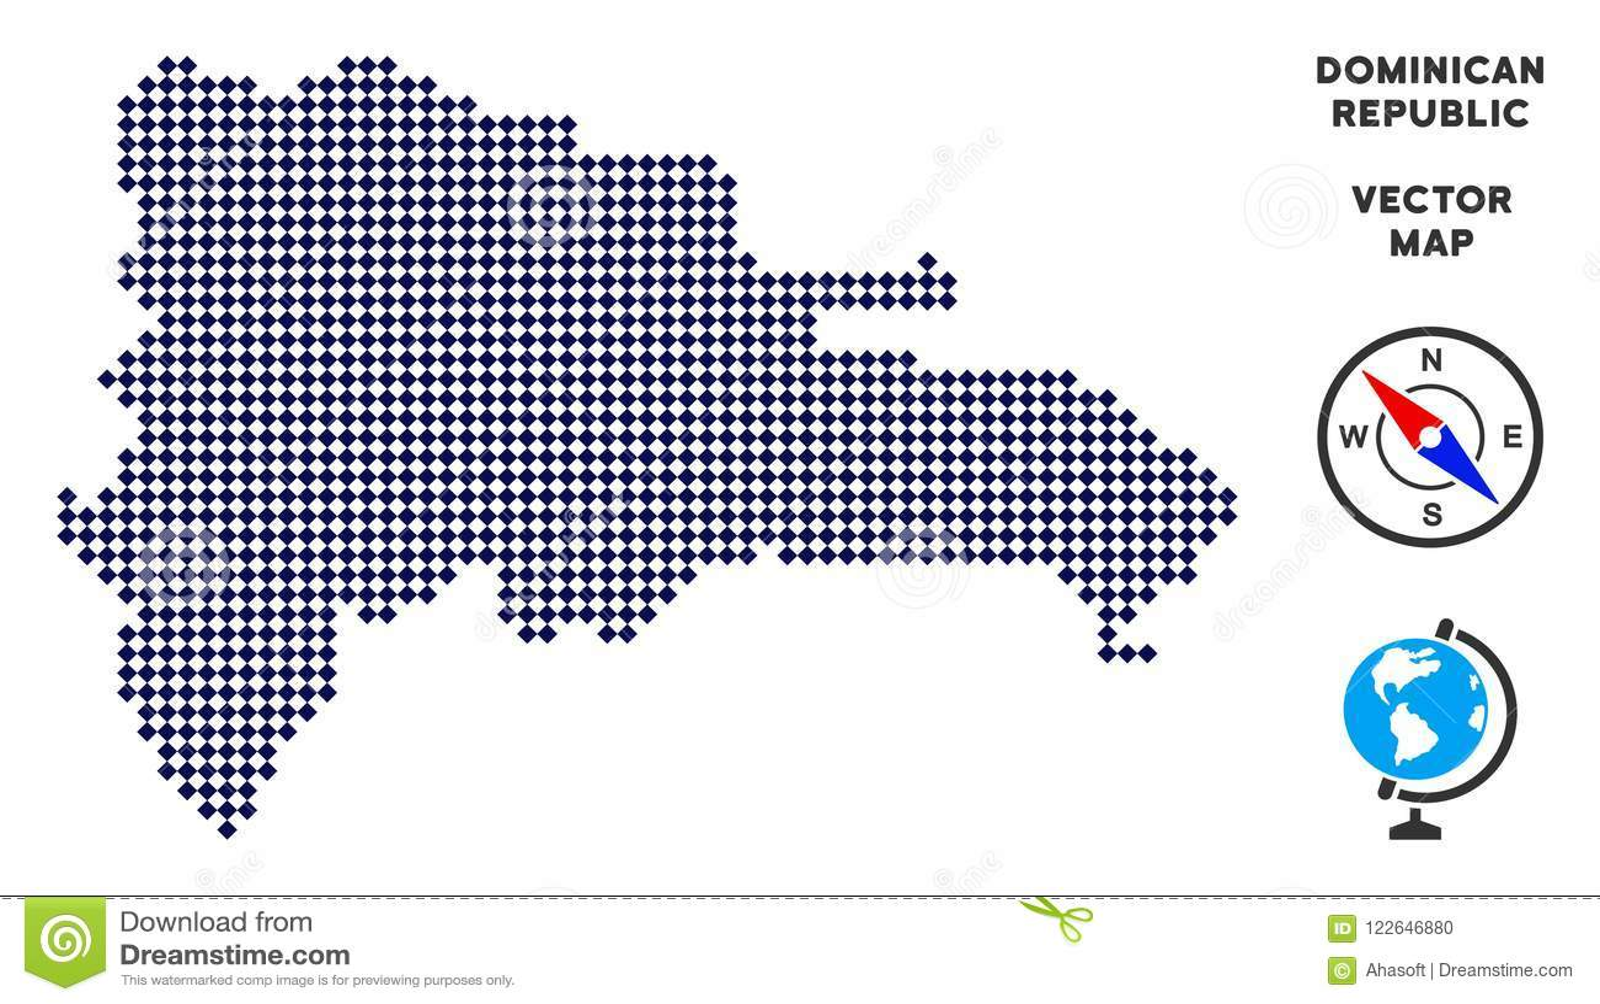 Dot Dominican Republic Map stock vector. Illustration of location ...